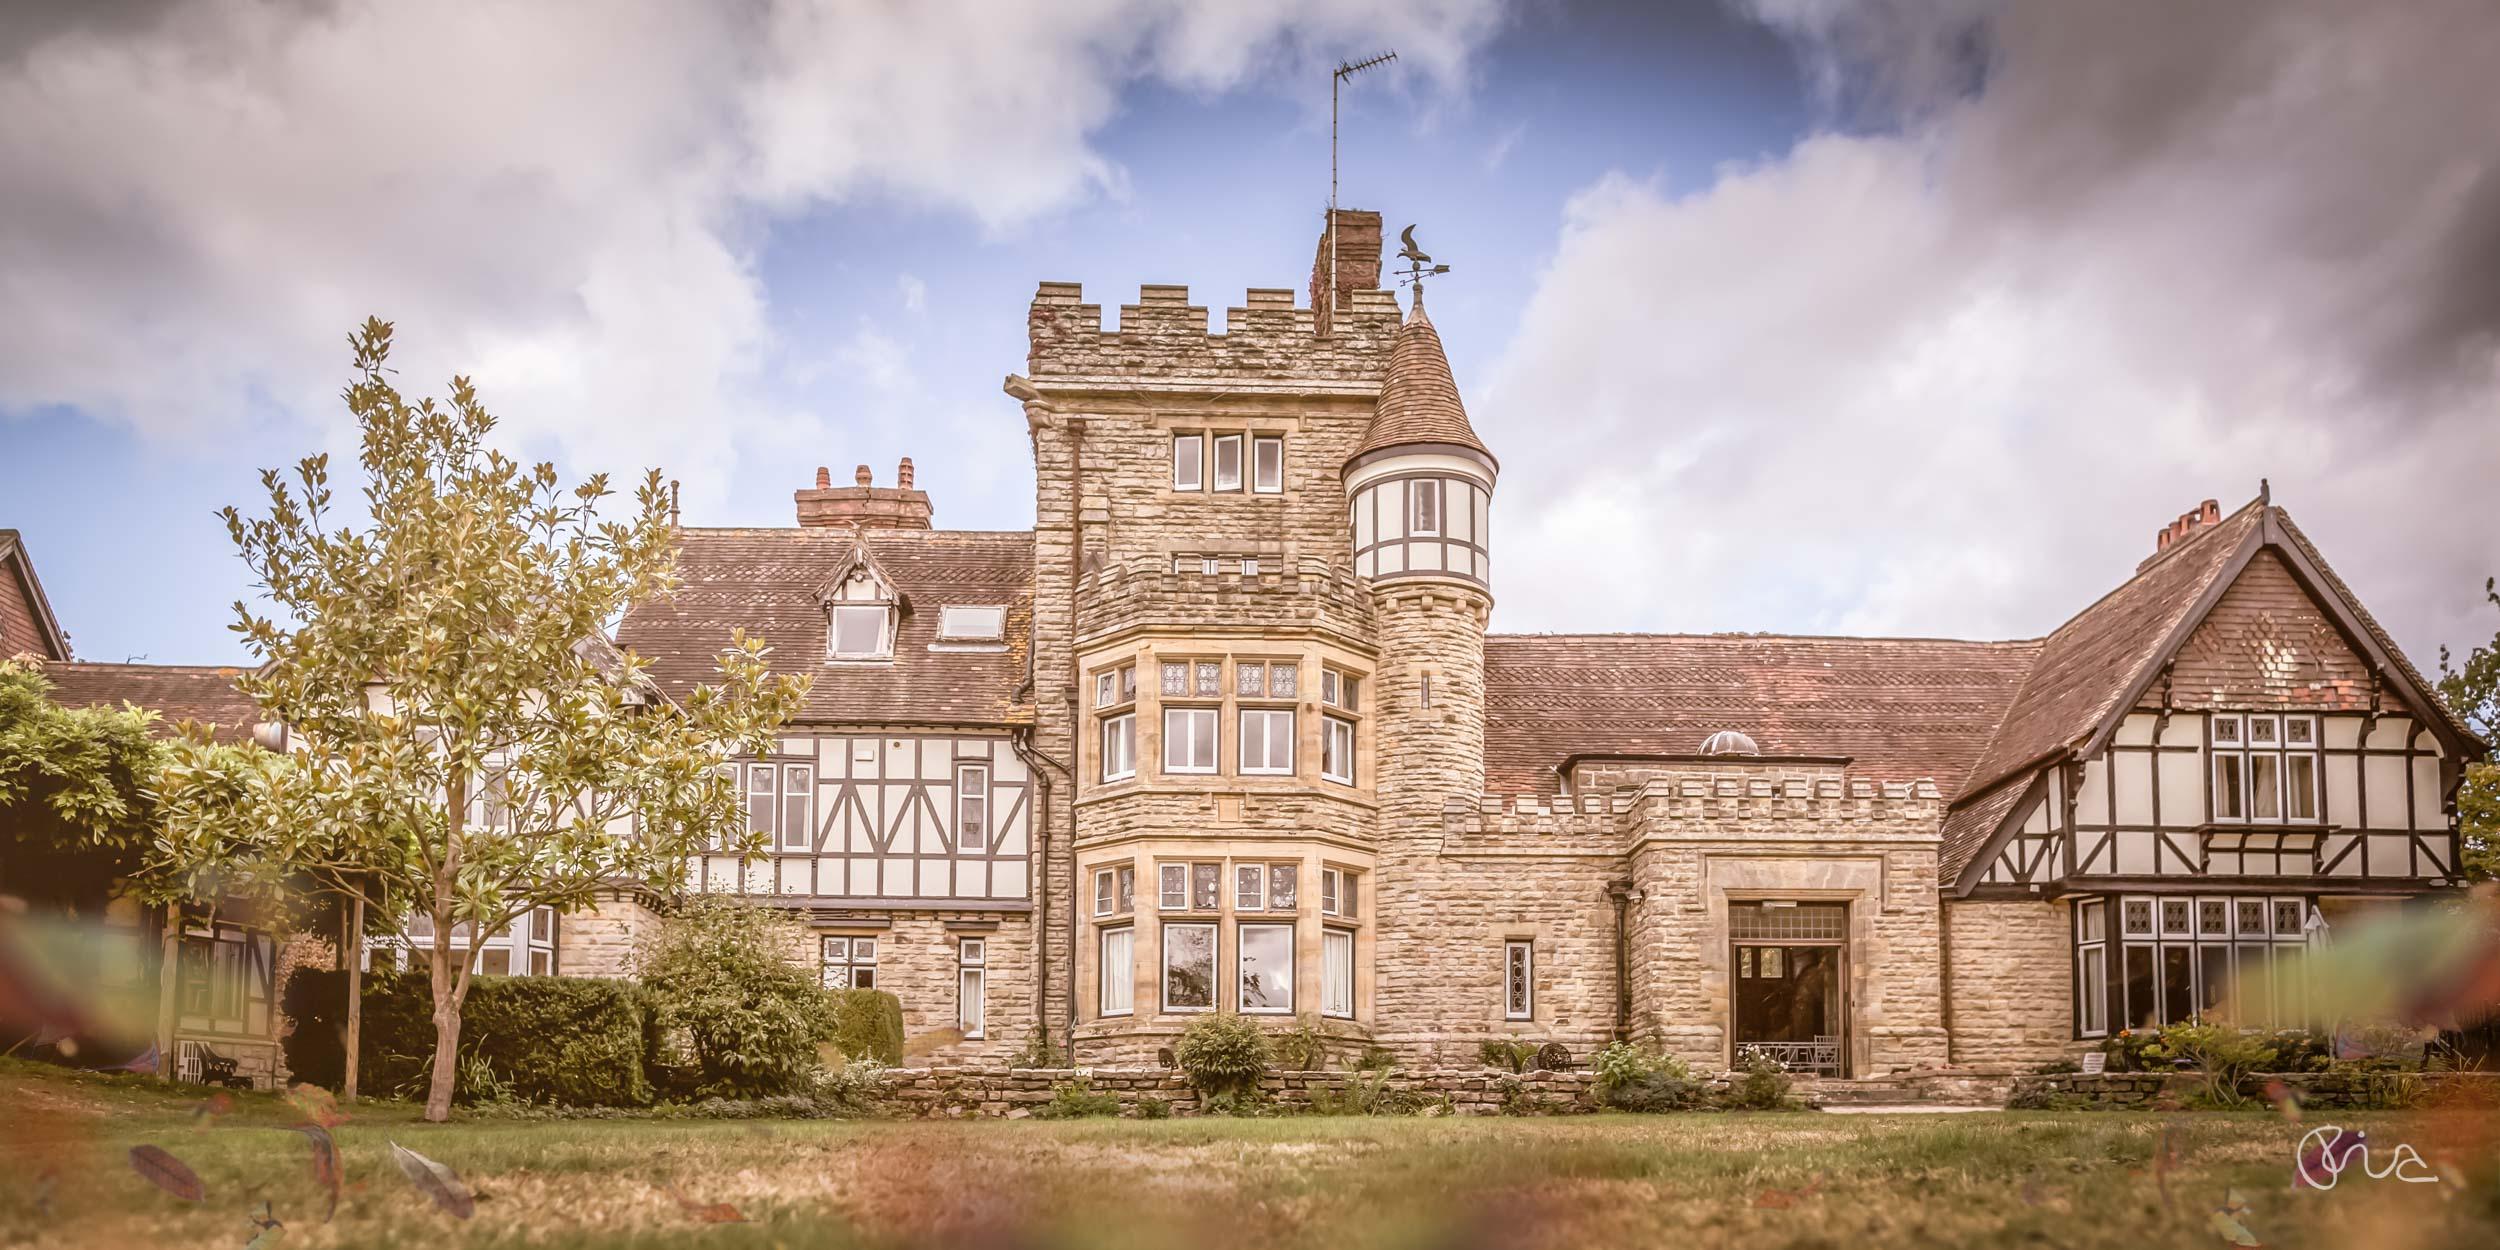 The Ravenswood Wedding venue